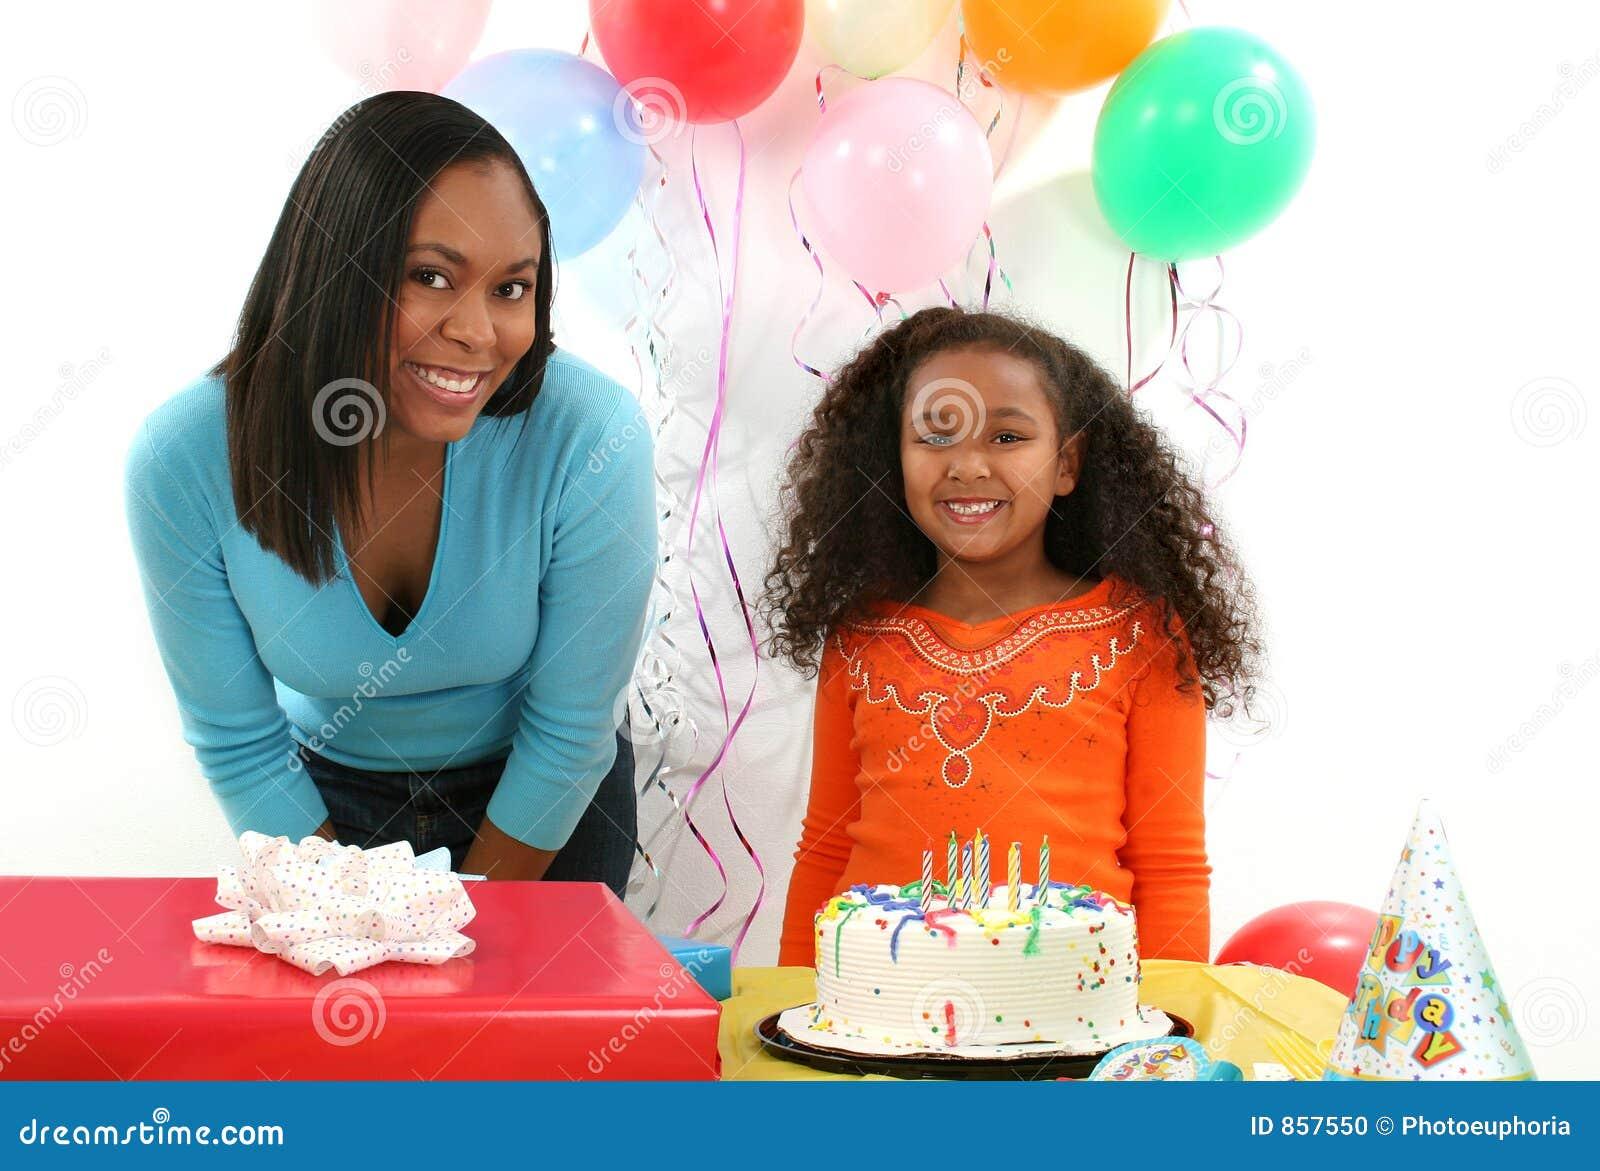 Woman, Child, Birthday